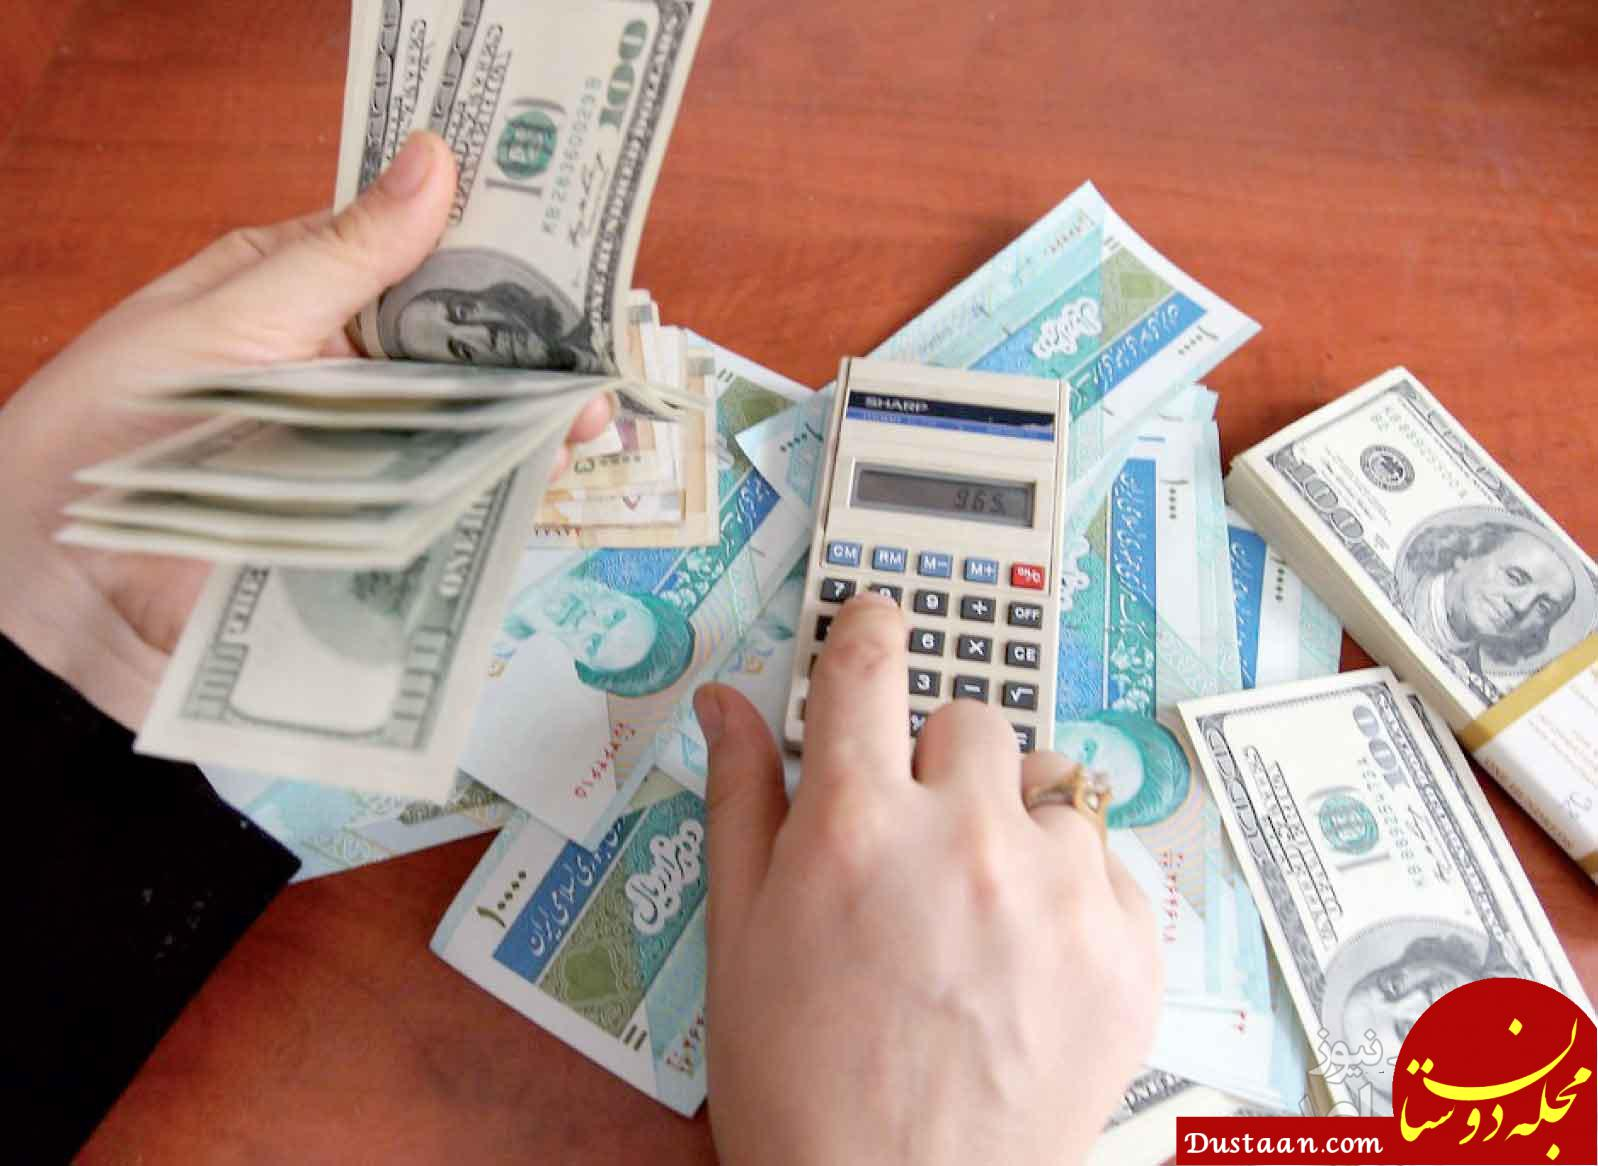 www.dustaan.com بازیگر 30 میلیونی دستمزد 400 میلیونی می خواهد!